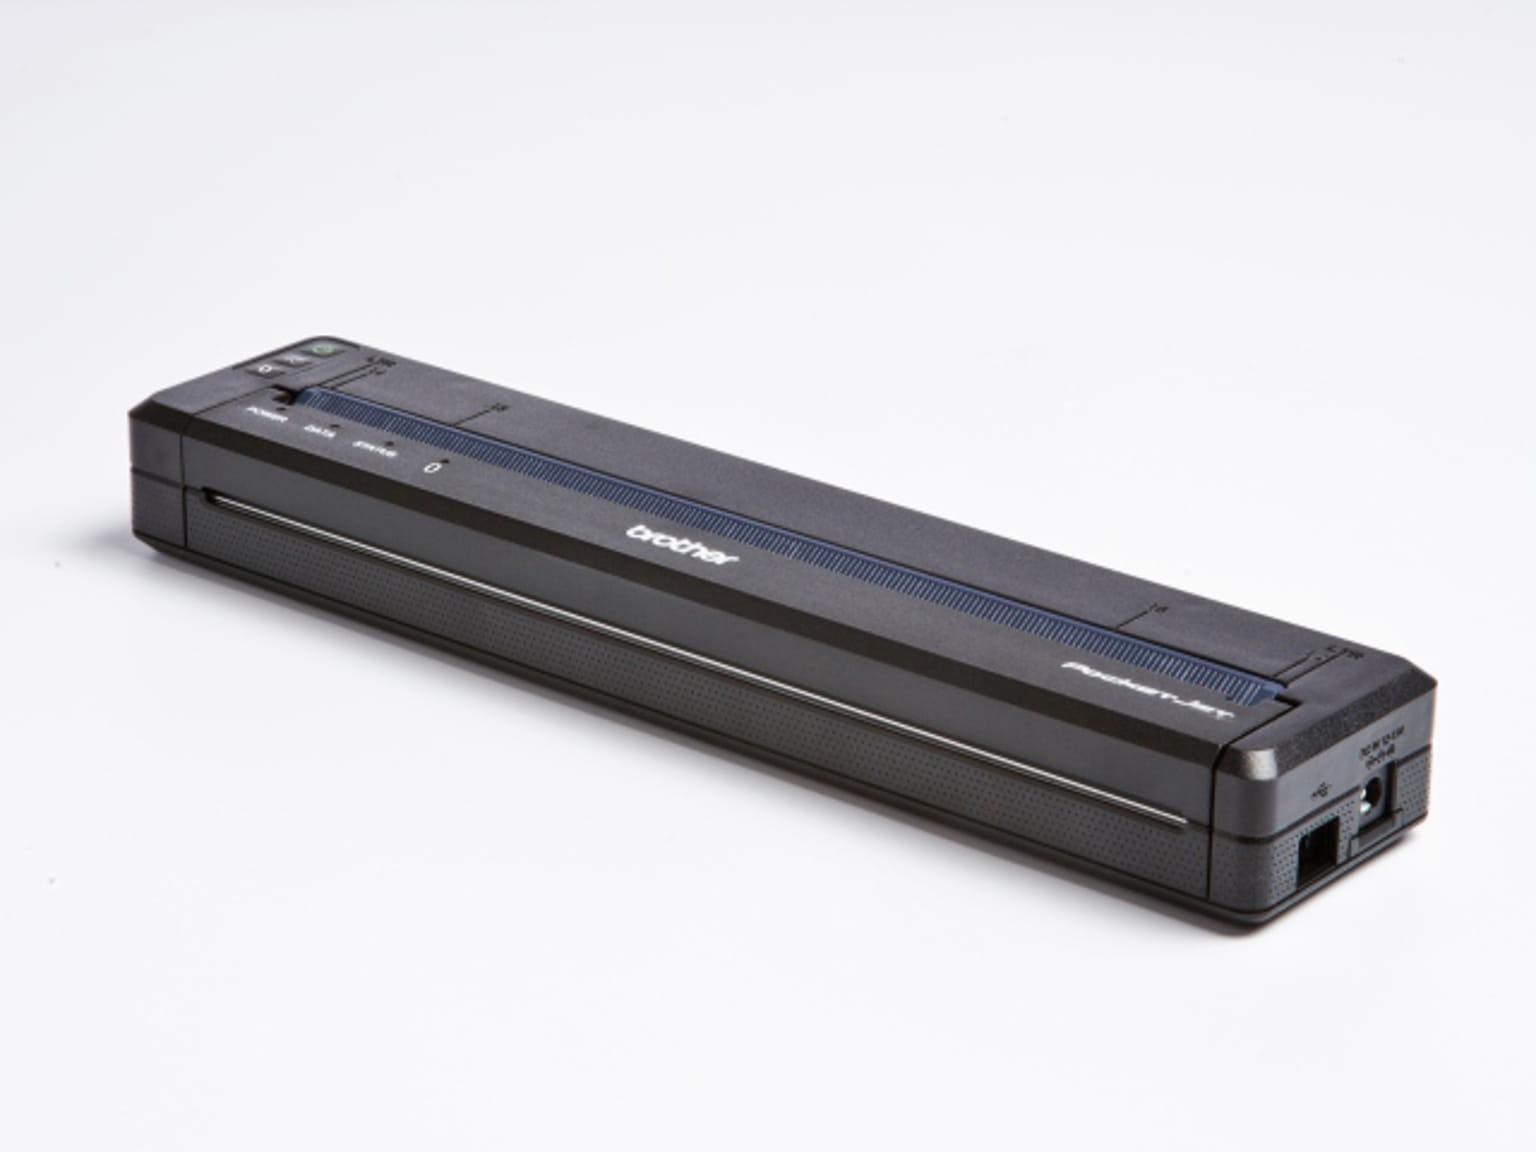 Impressoras portáteis série PJ